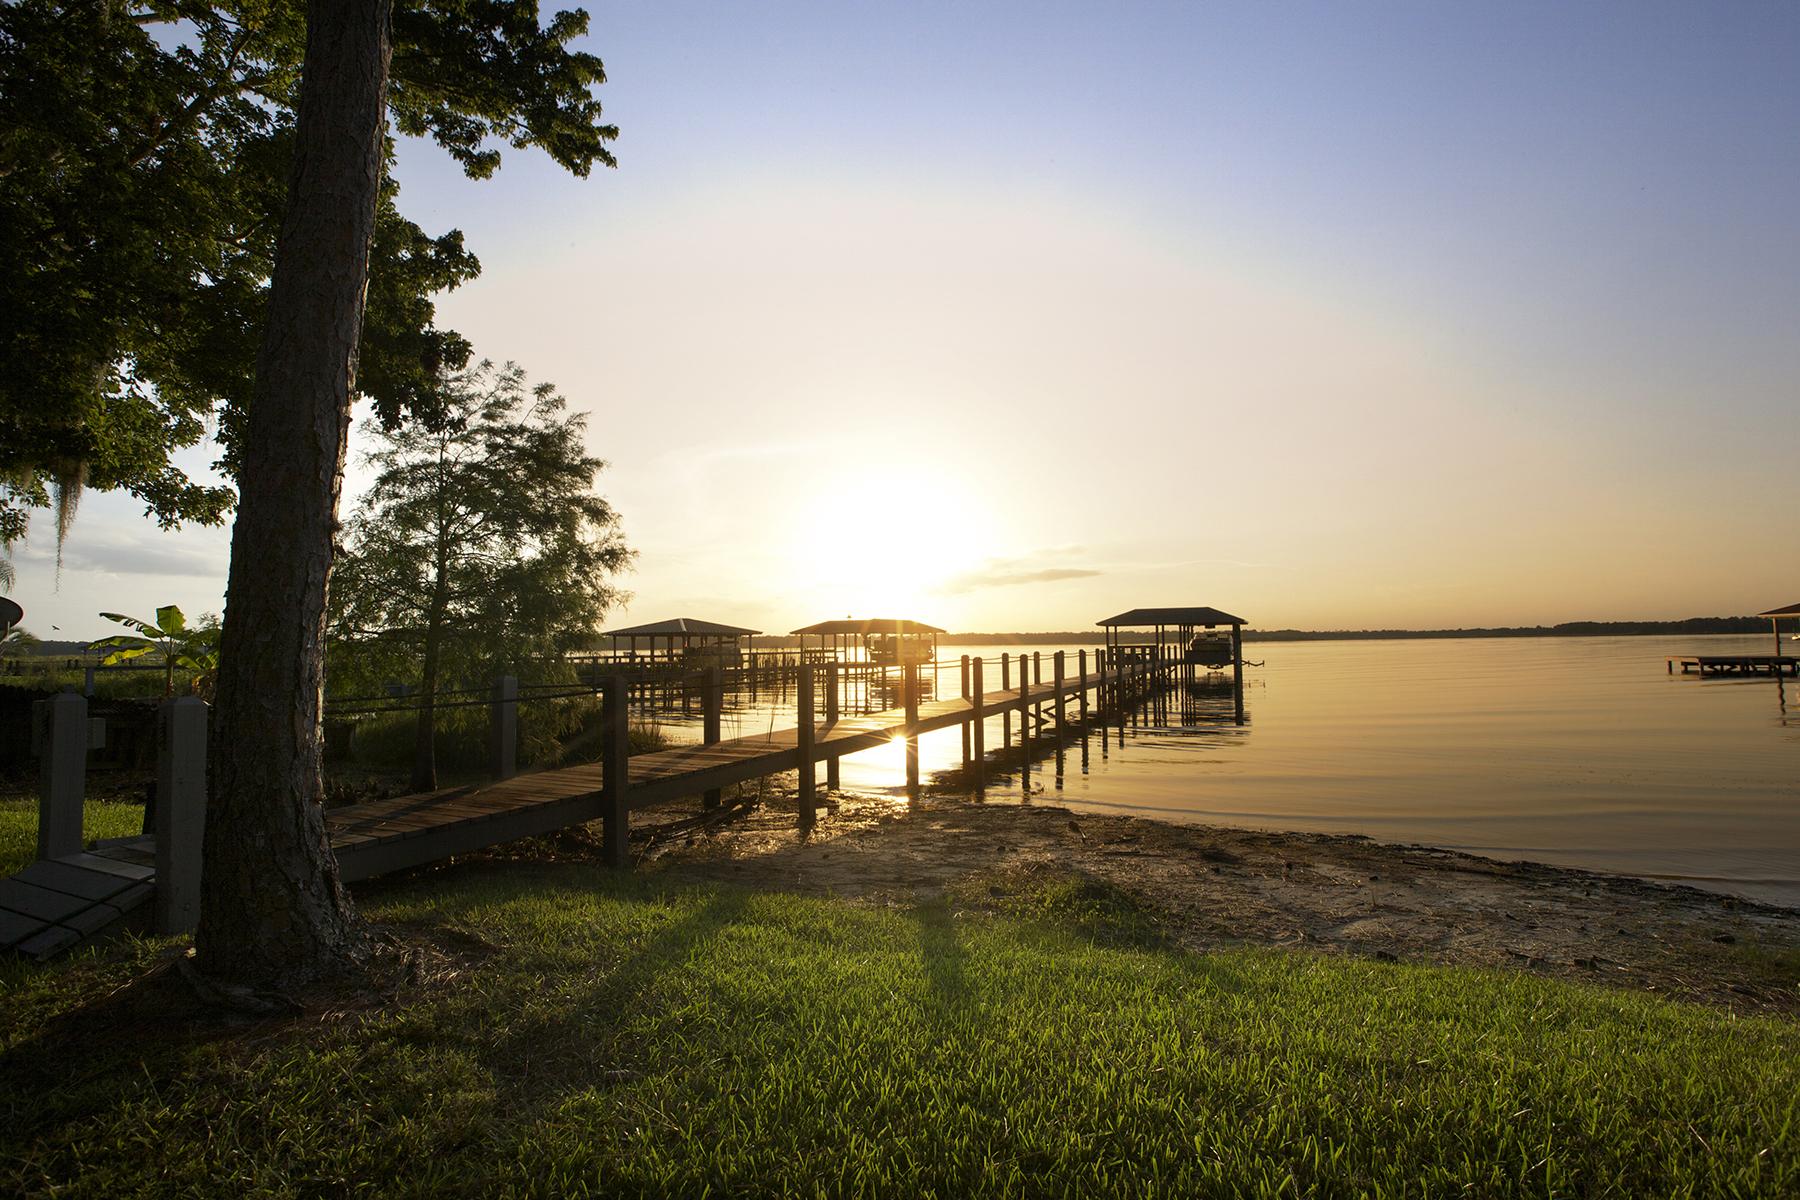 Single Family Home for Sale at ORLANDO 13452 Lake Mary Jane Rd Orlando, Florida, 32832 United States